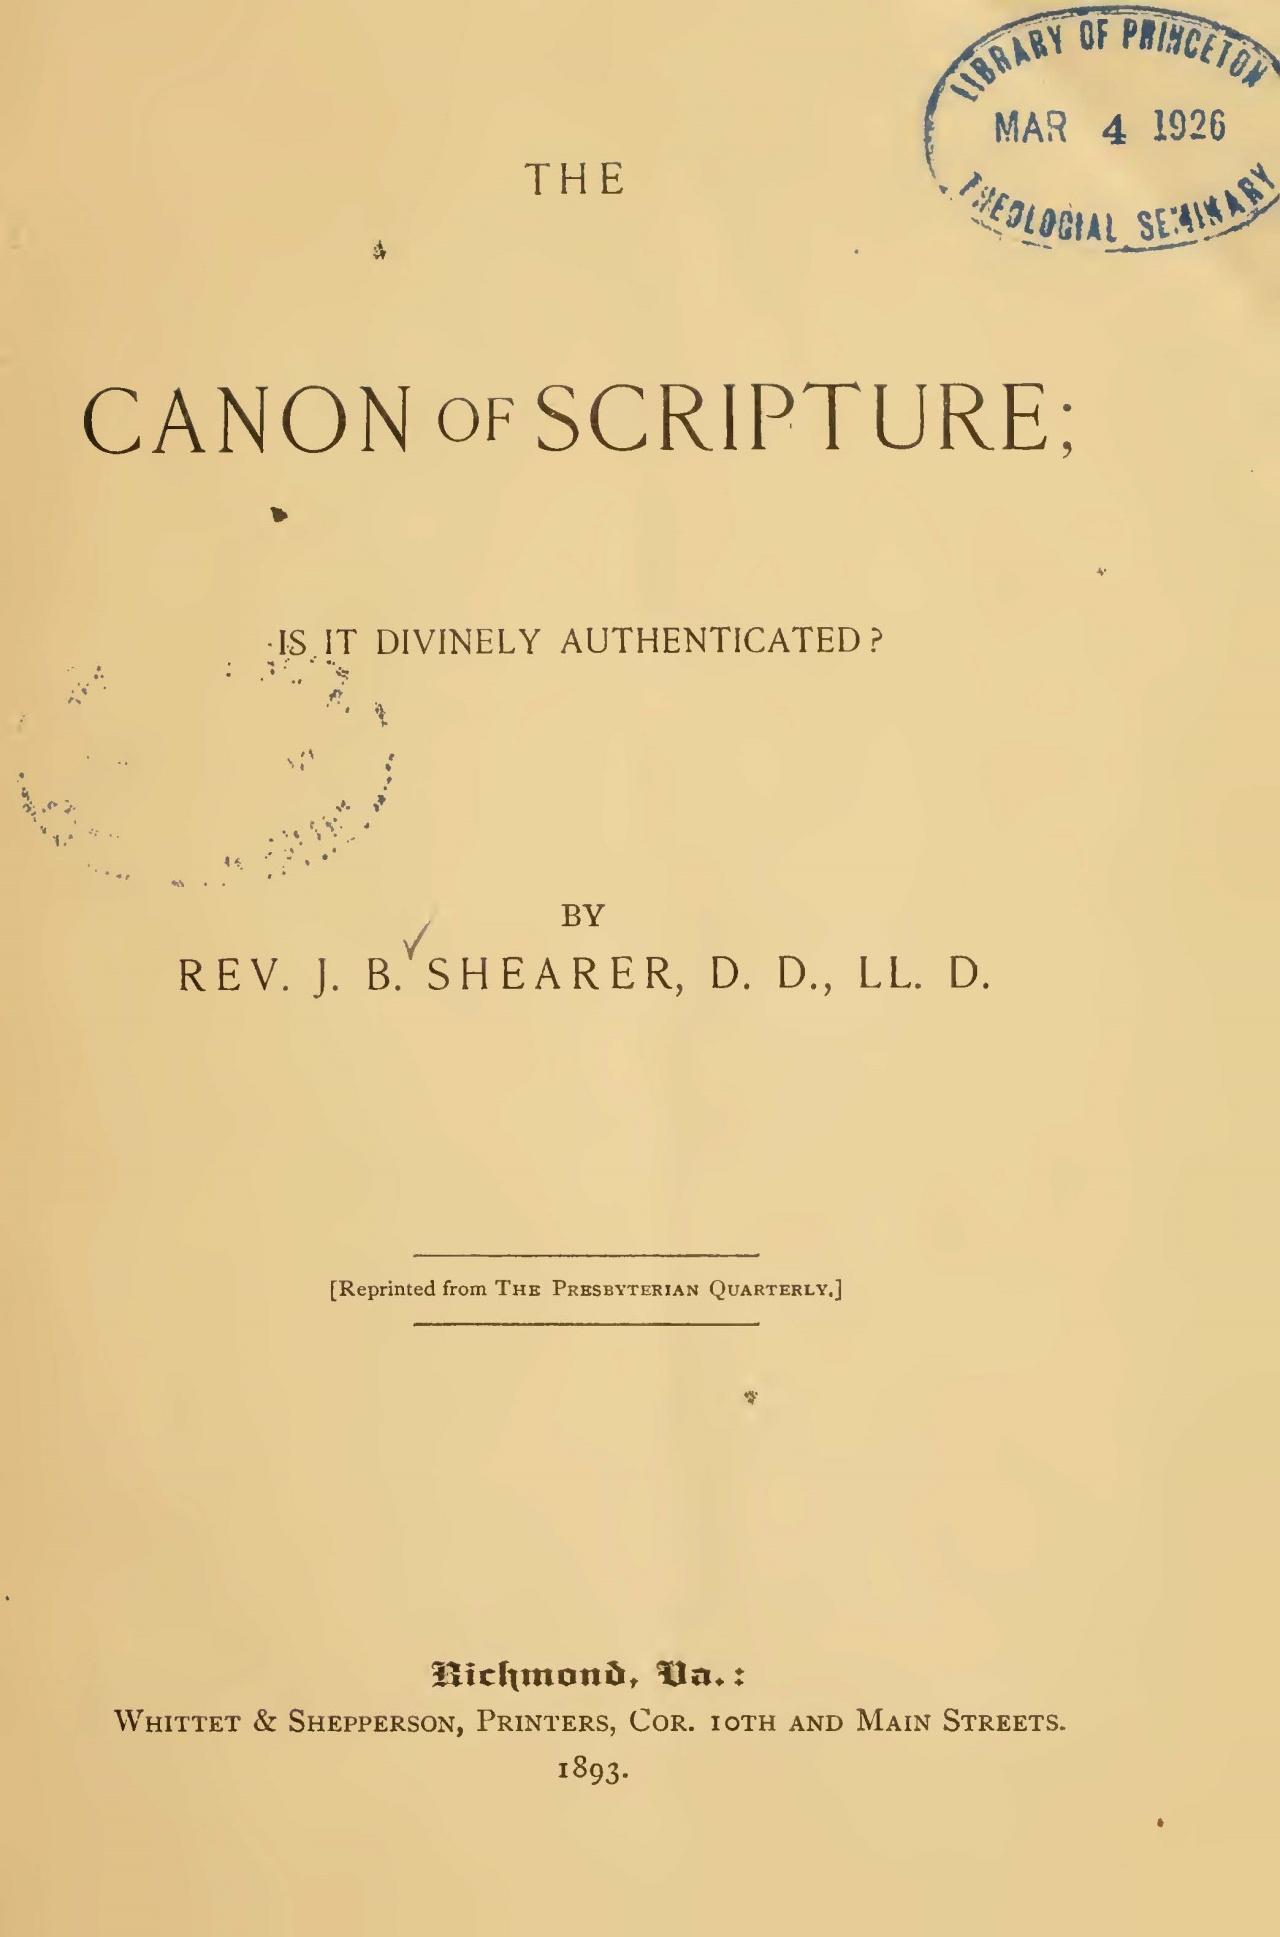 Shearer, John Bunyan, The Canon of Scripture Title Page.jpg